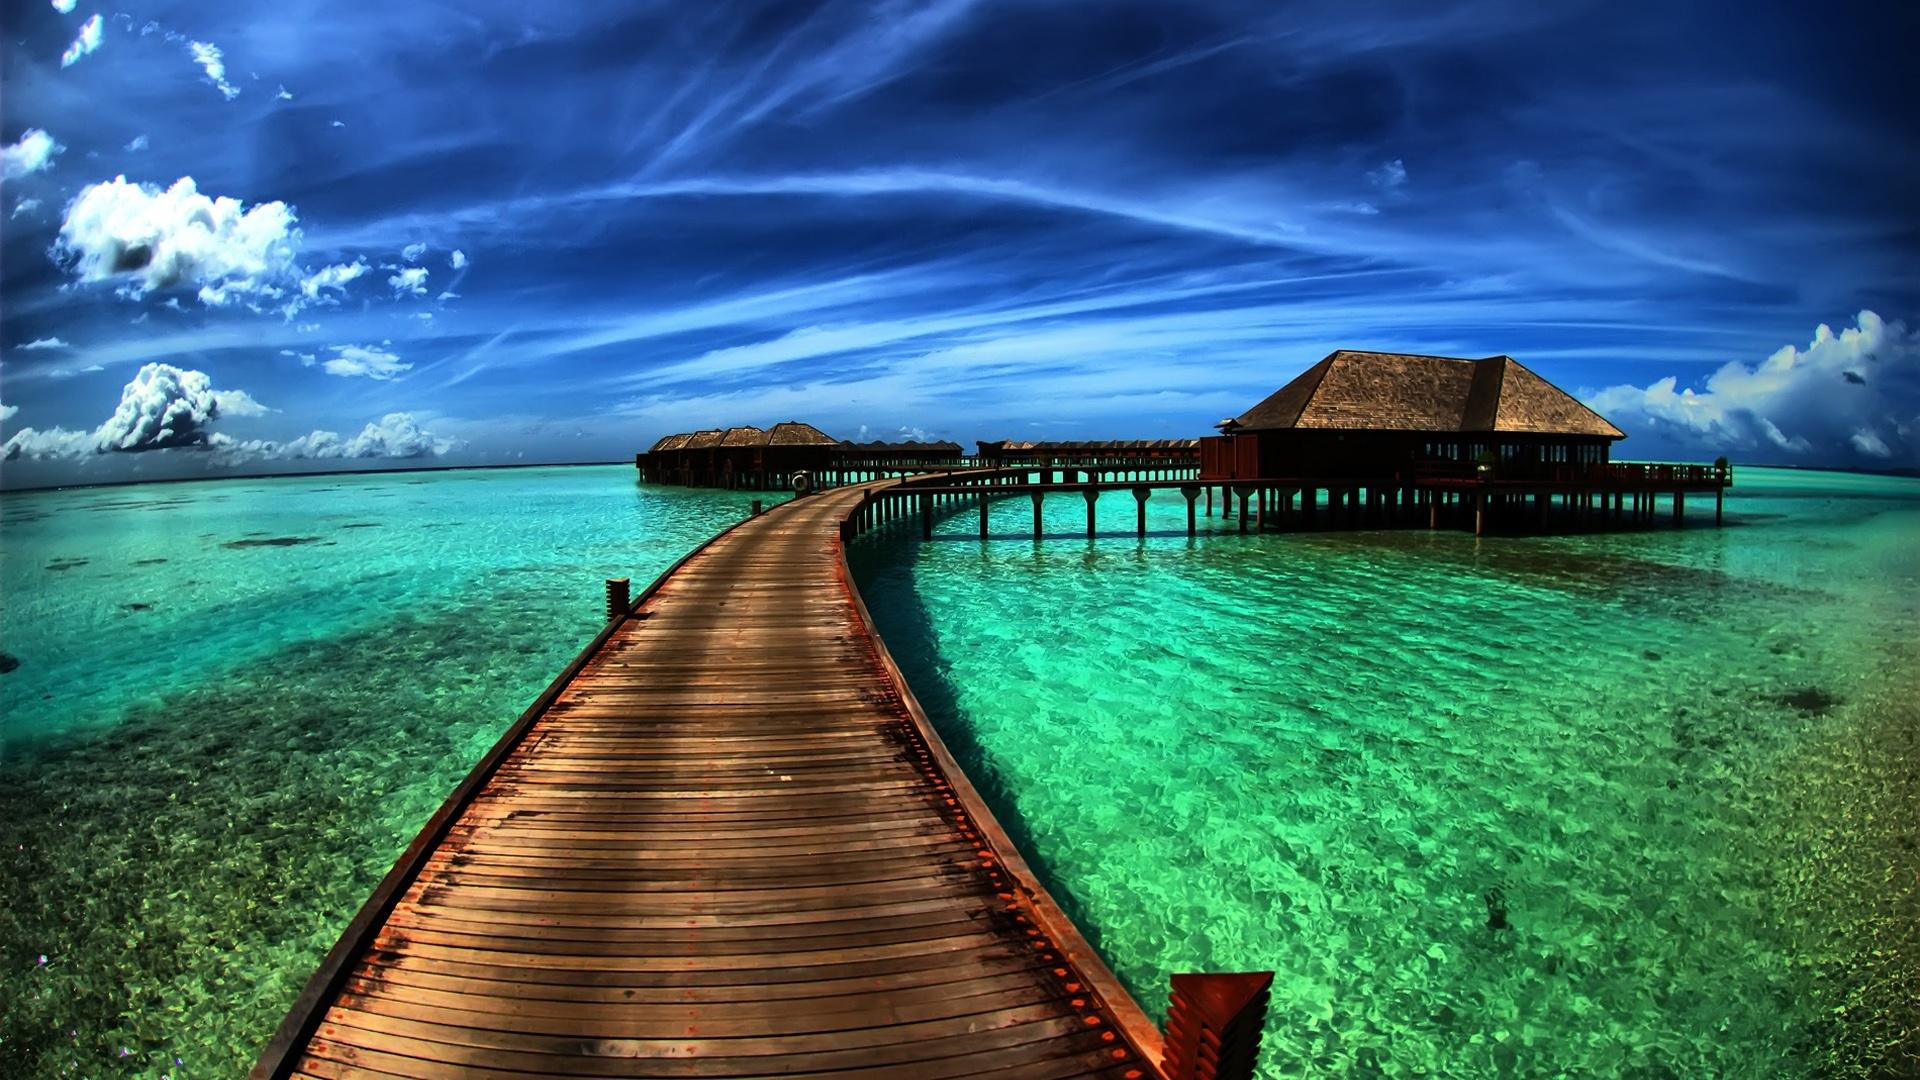 http://4.bp.blogspot.com/-Fa8Ob3nMnJY/UGmbo-hisXI/AAAAAAAALDk/JXvBnv6kyhE/s0/amazing-sea-resort-1920x1080-wallpaper.jpg